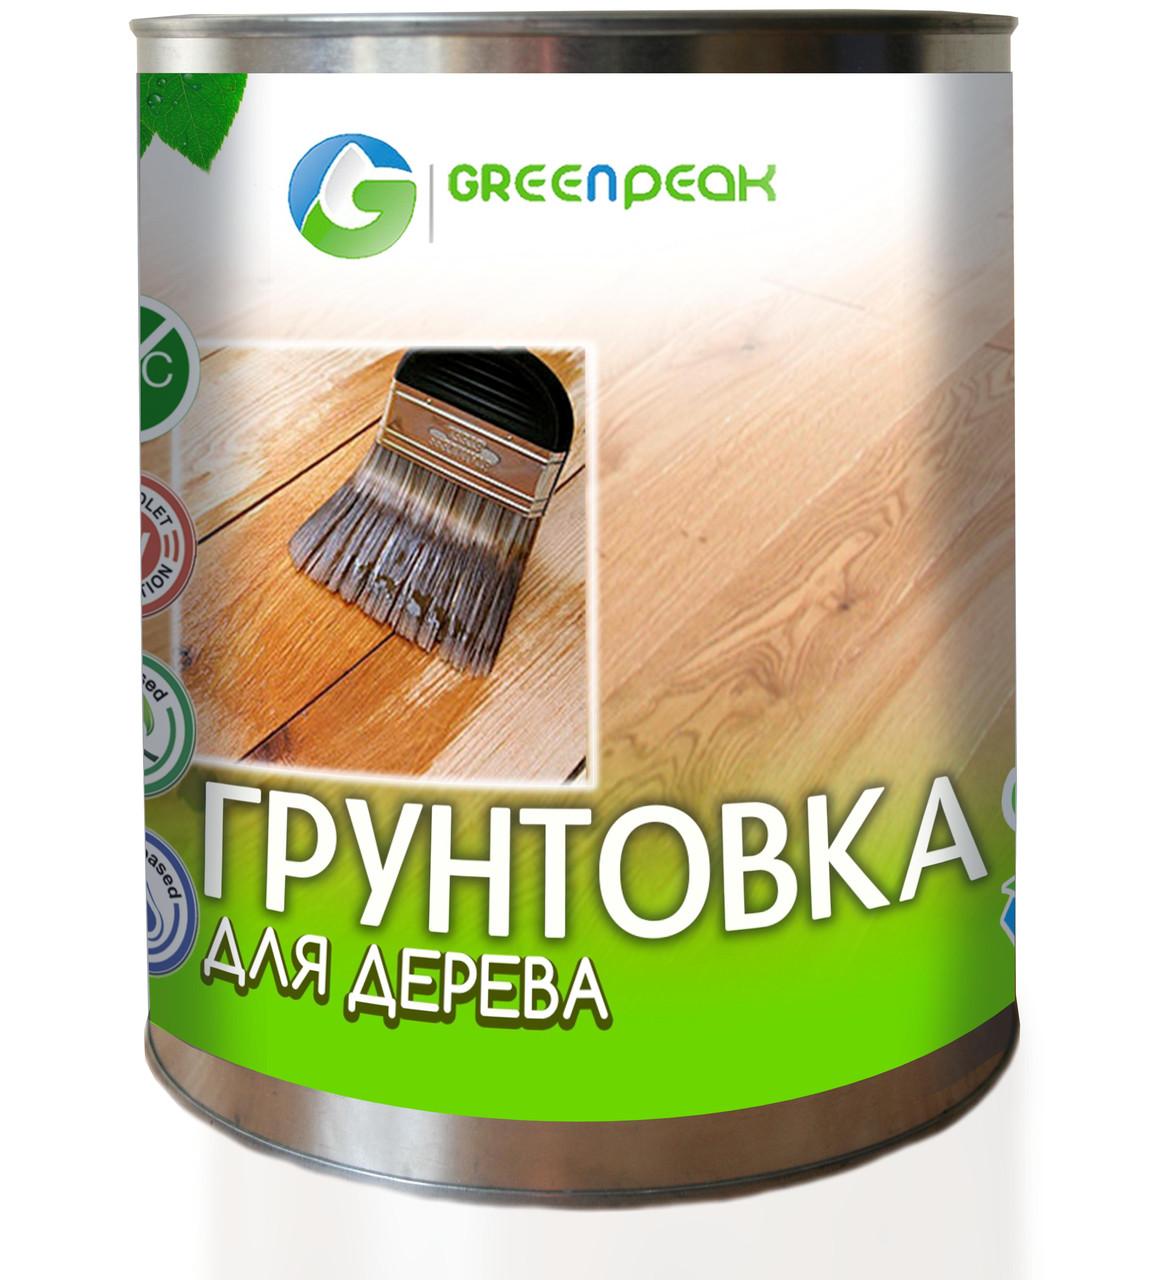 GREENSAVE-Grund : Био-грунтовка для дерева